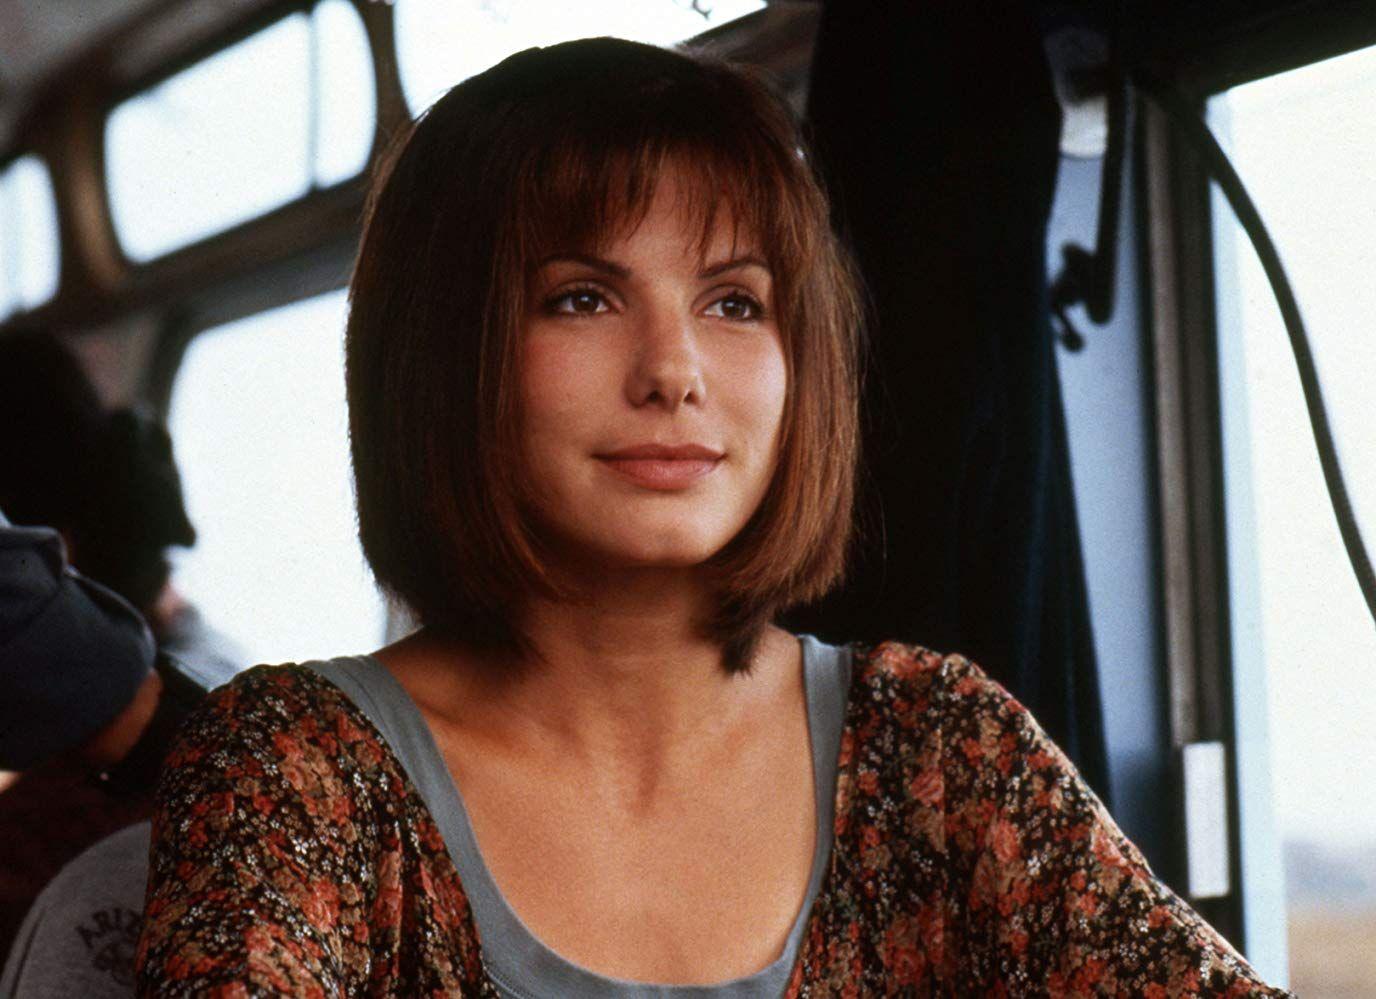 The Best 32 Sandra Bullock Movies - Top Sandra Bullock Films